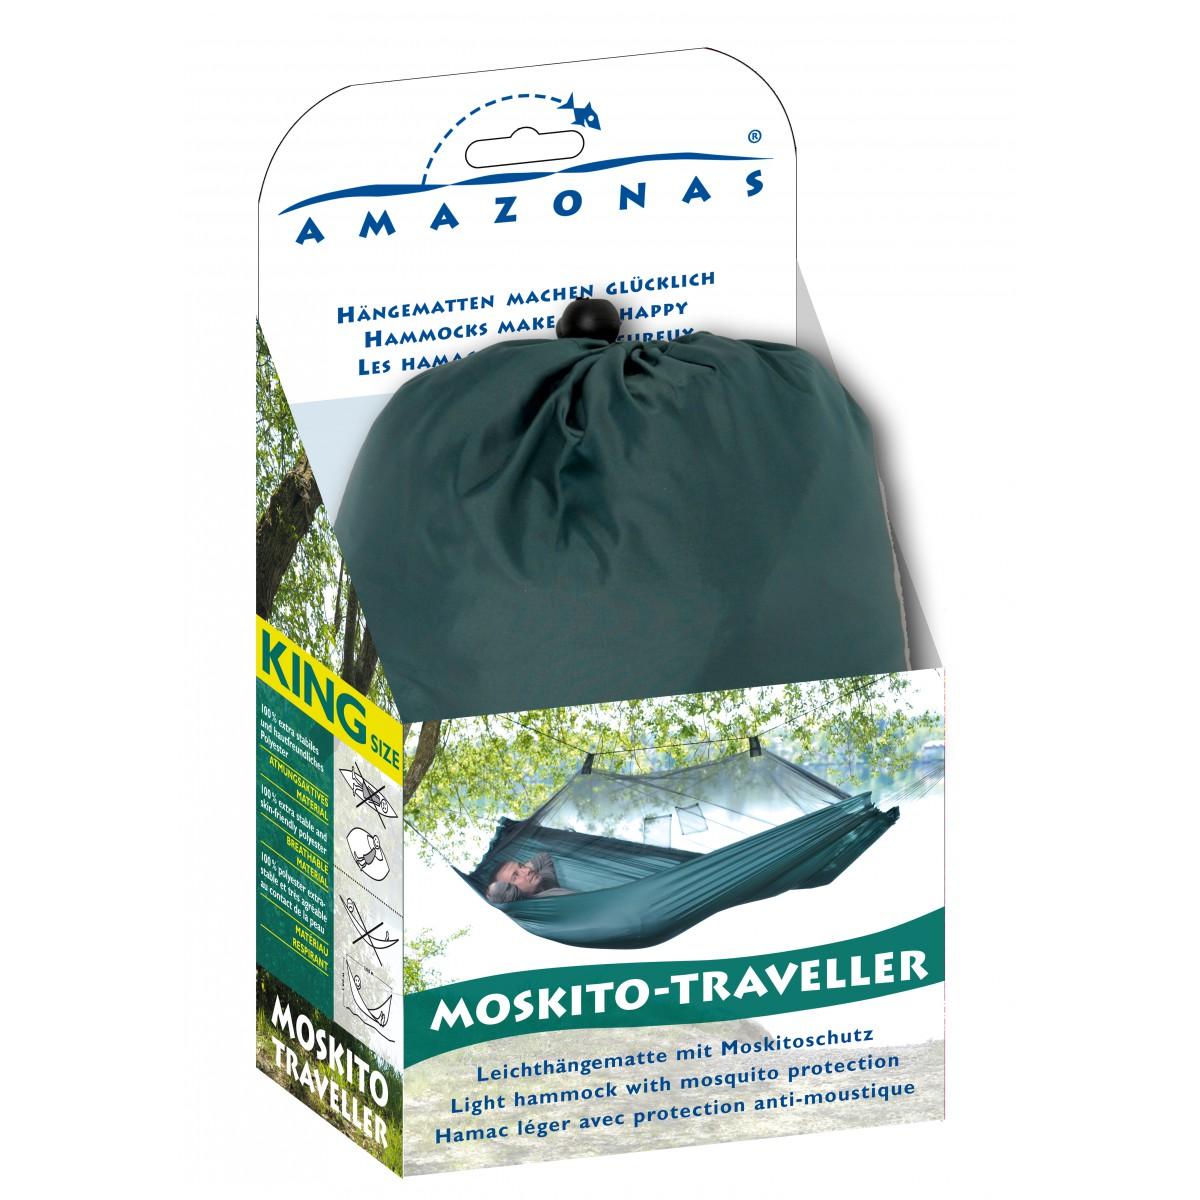 De Hamac Moustiquaire Moskito Hamacs Amazonas Traveller Bivouac DH29WeYEI